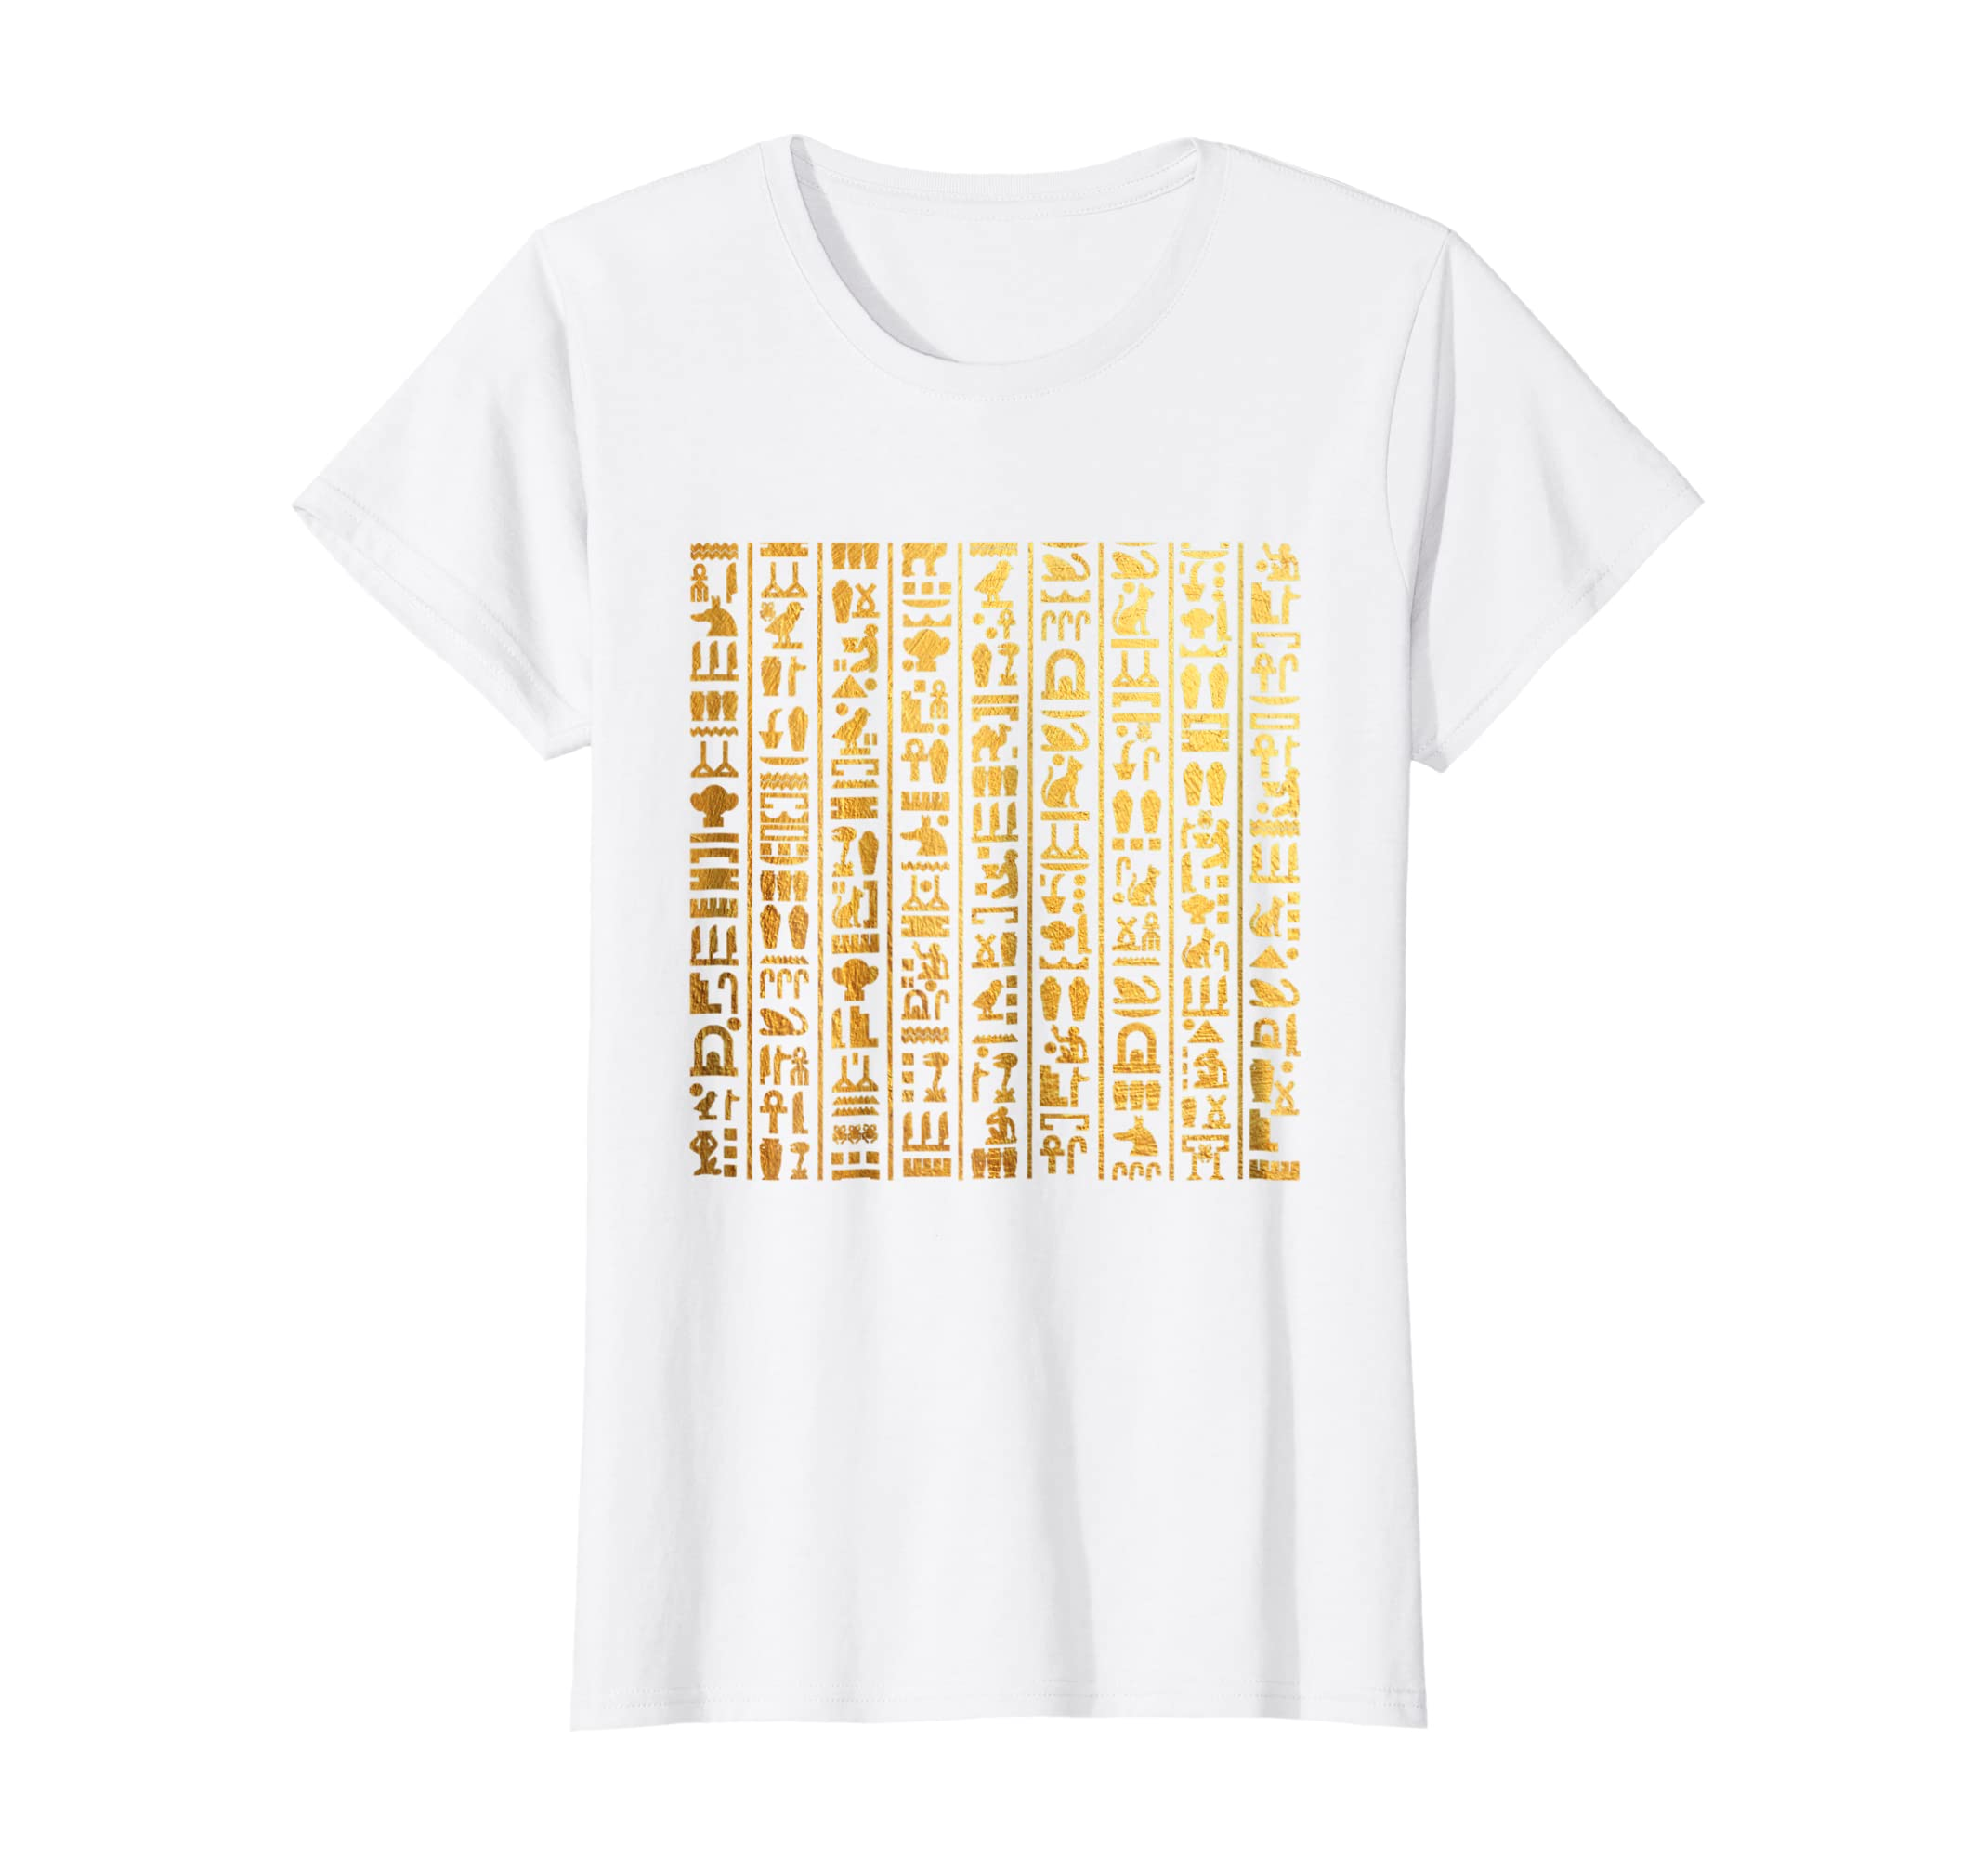 Egyptian Hieroglyphics Shirt   Ancient Egypt Shirt-Bawle